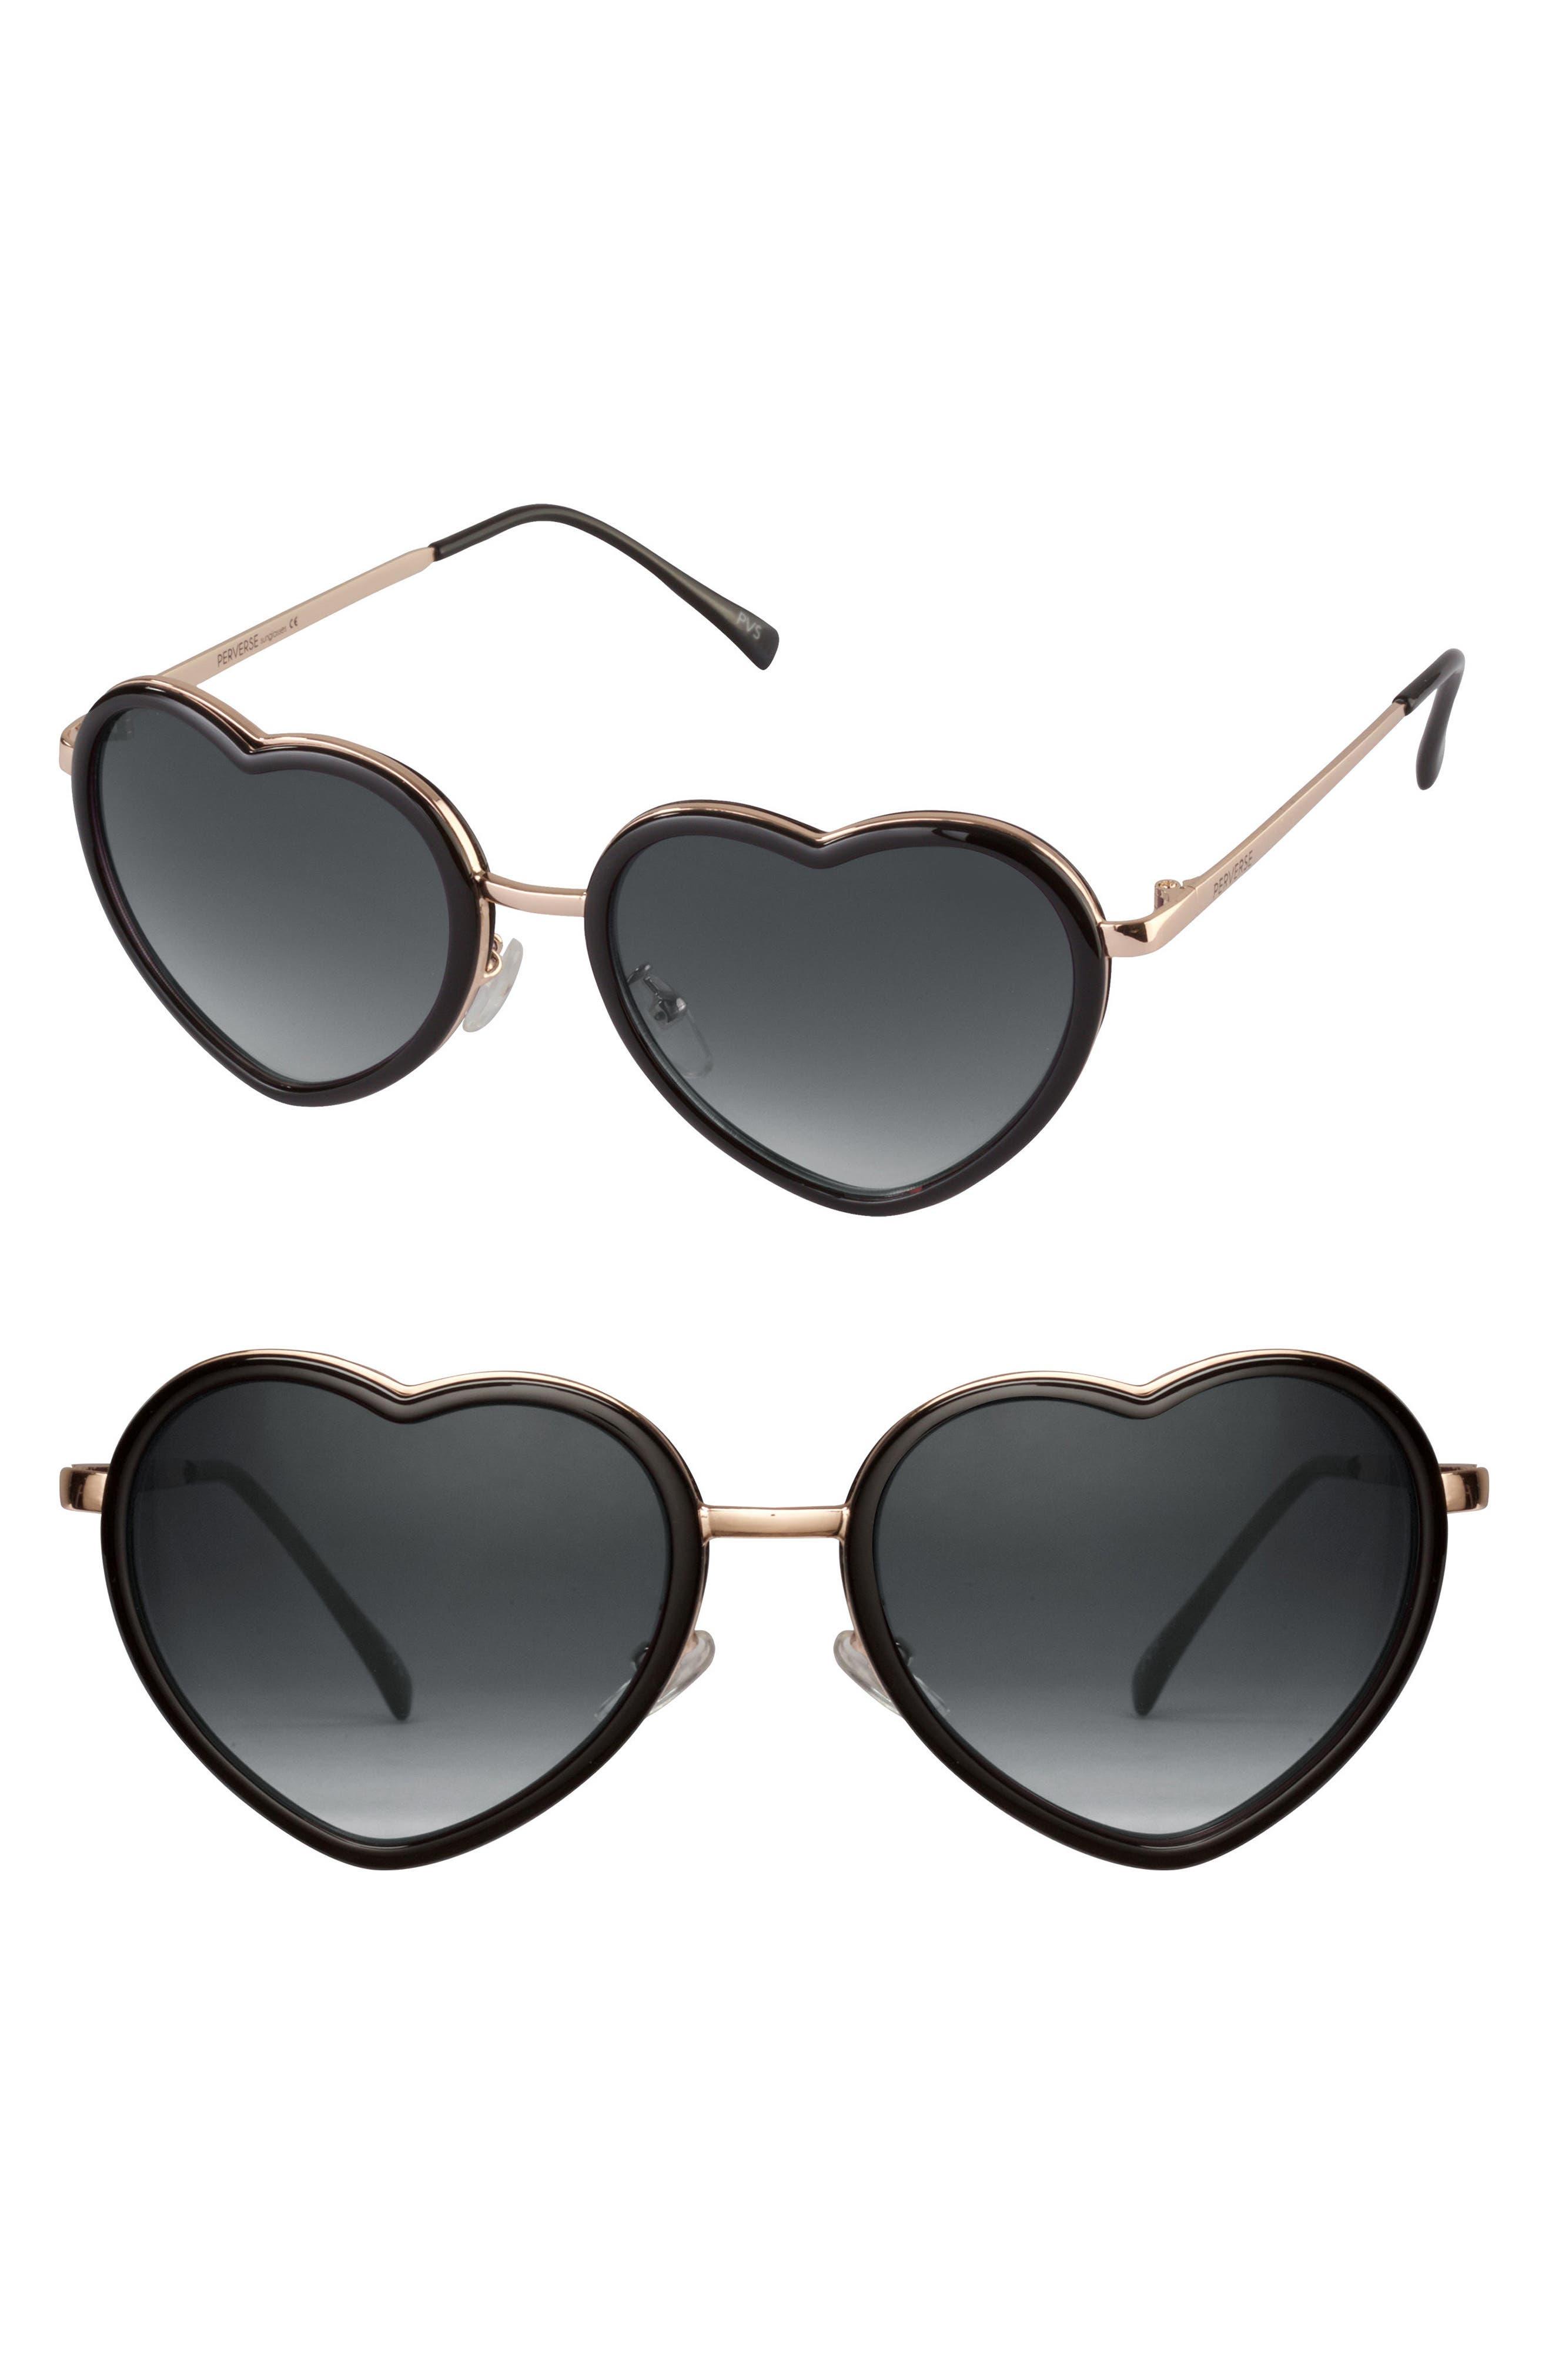 Poipu 52mm Heart Sunglasses,                             Main thumbnail 1, color,                             Black